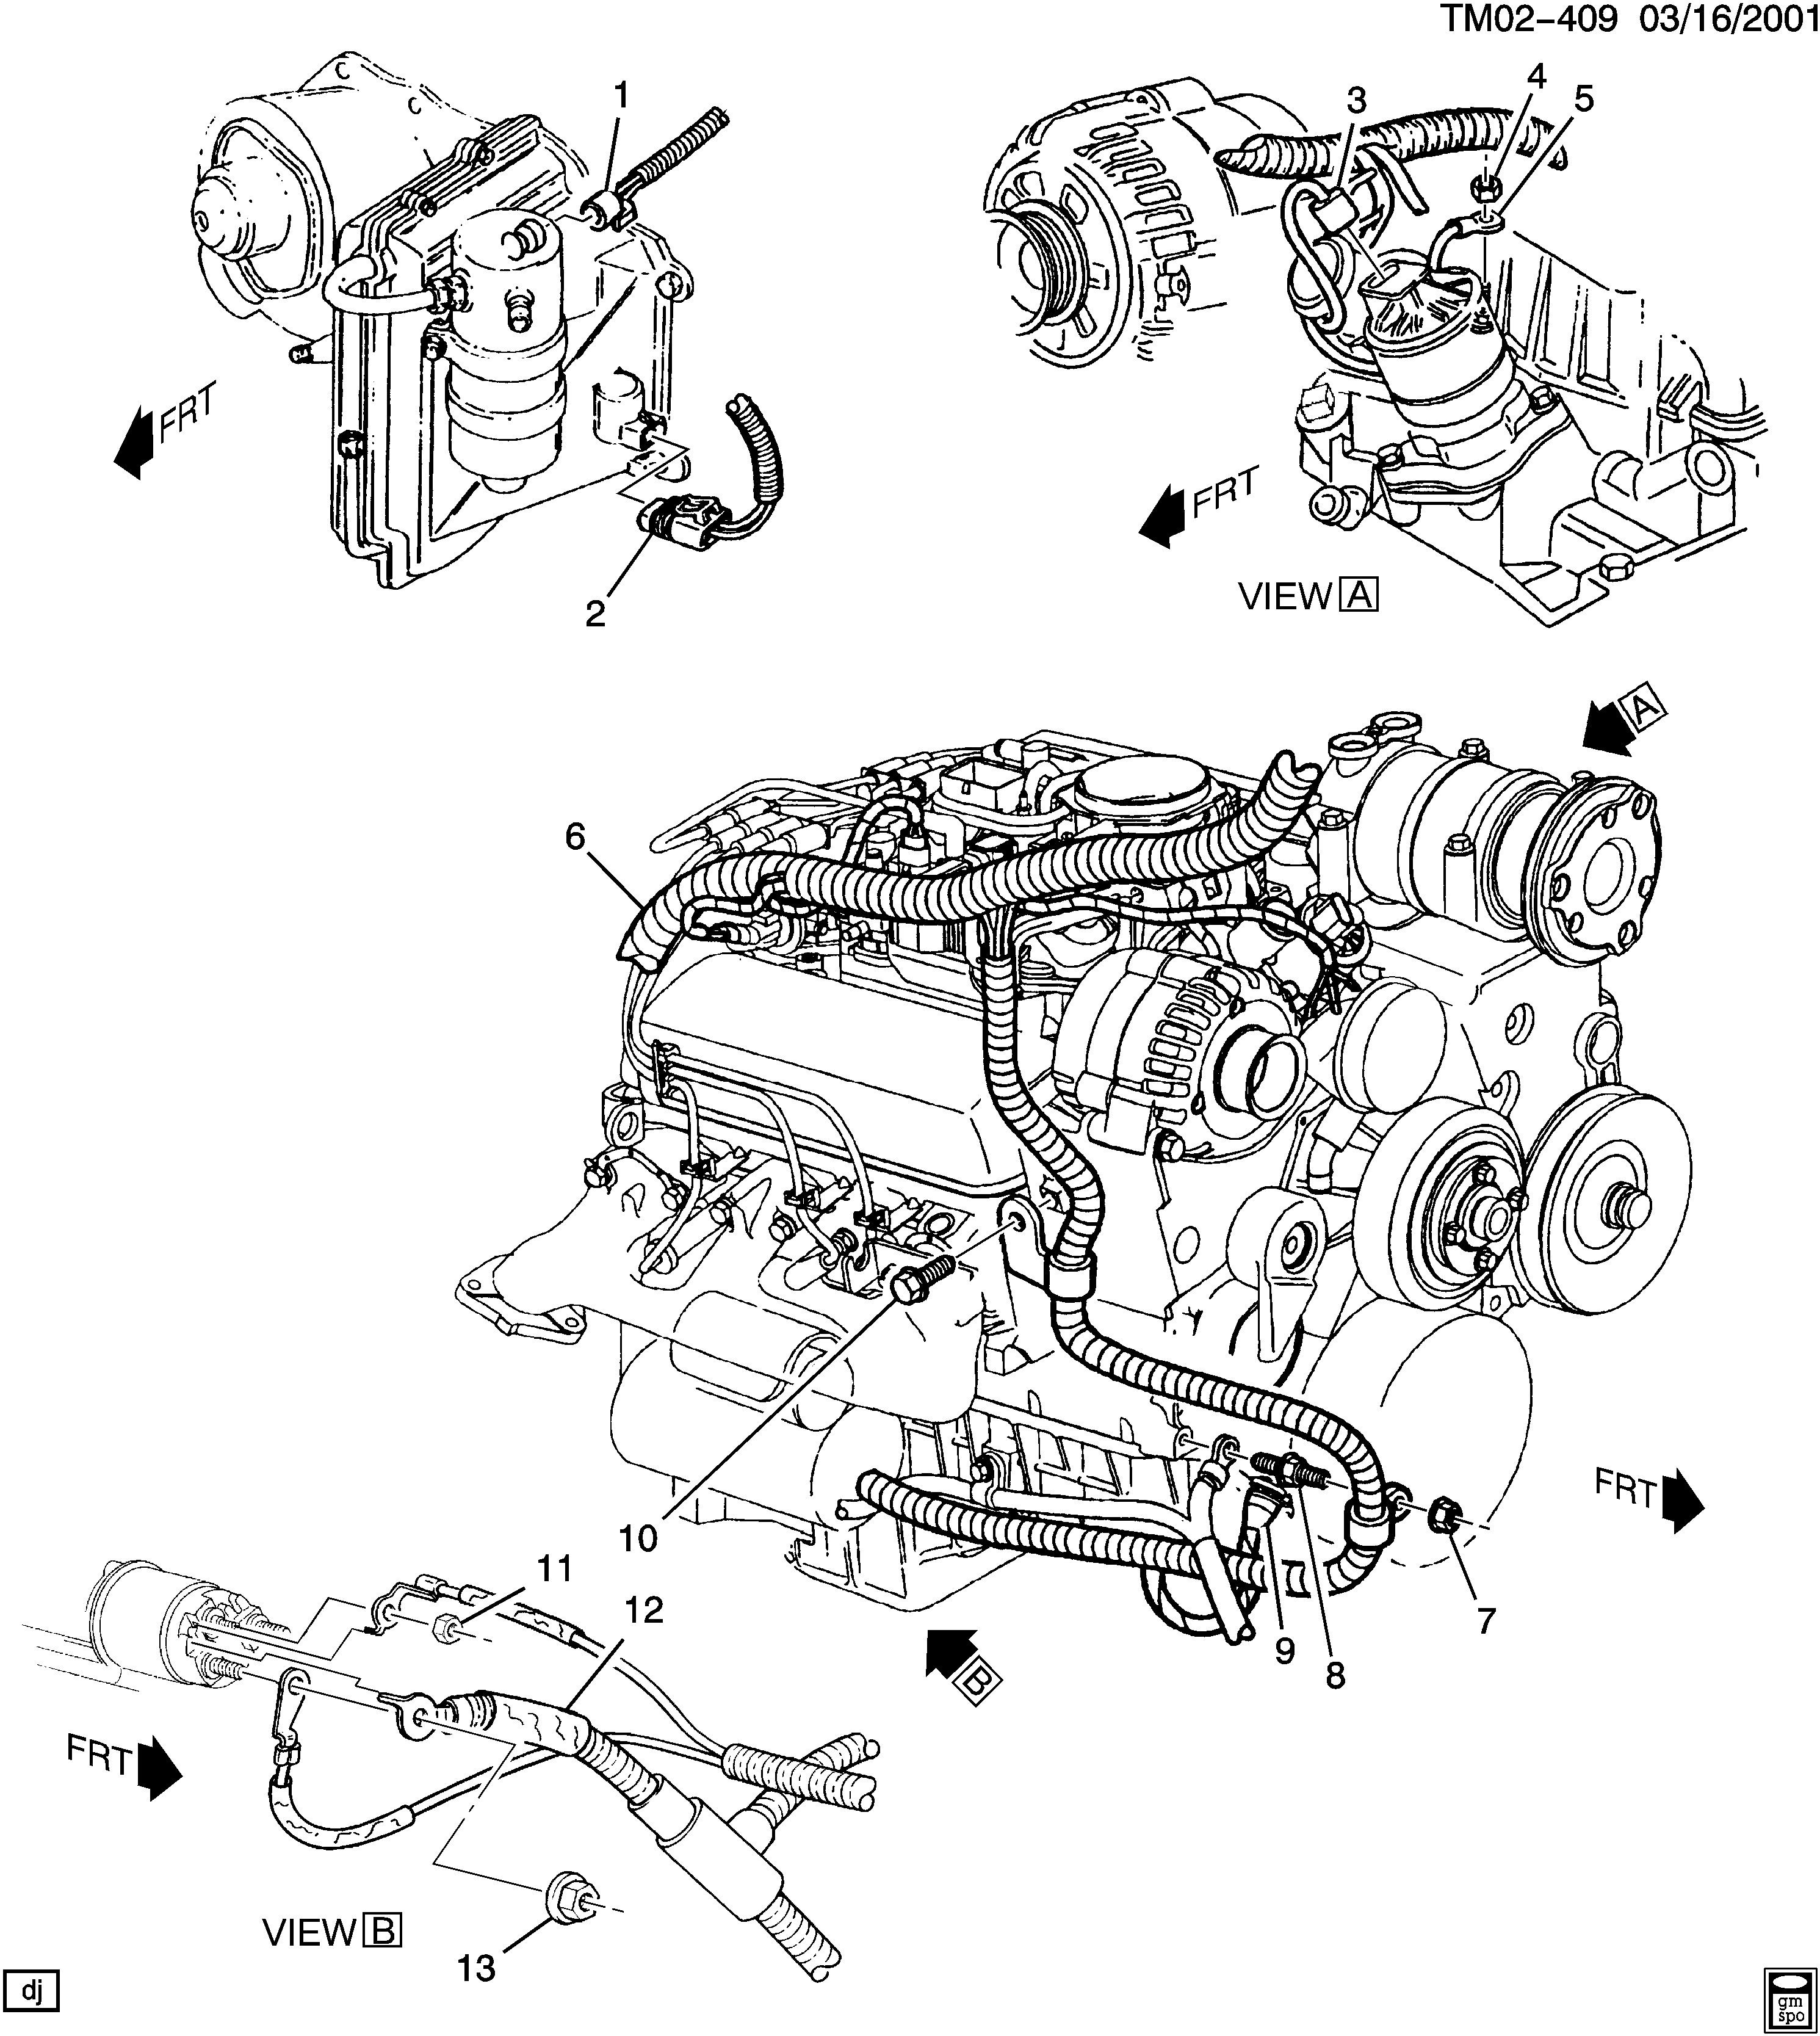 Astro 2wd Wiring Harness Engine Part 4 Rh Side Chevrolet Epc Zc Online Nemigacom